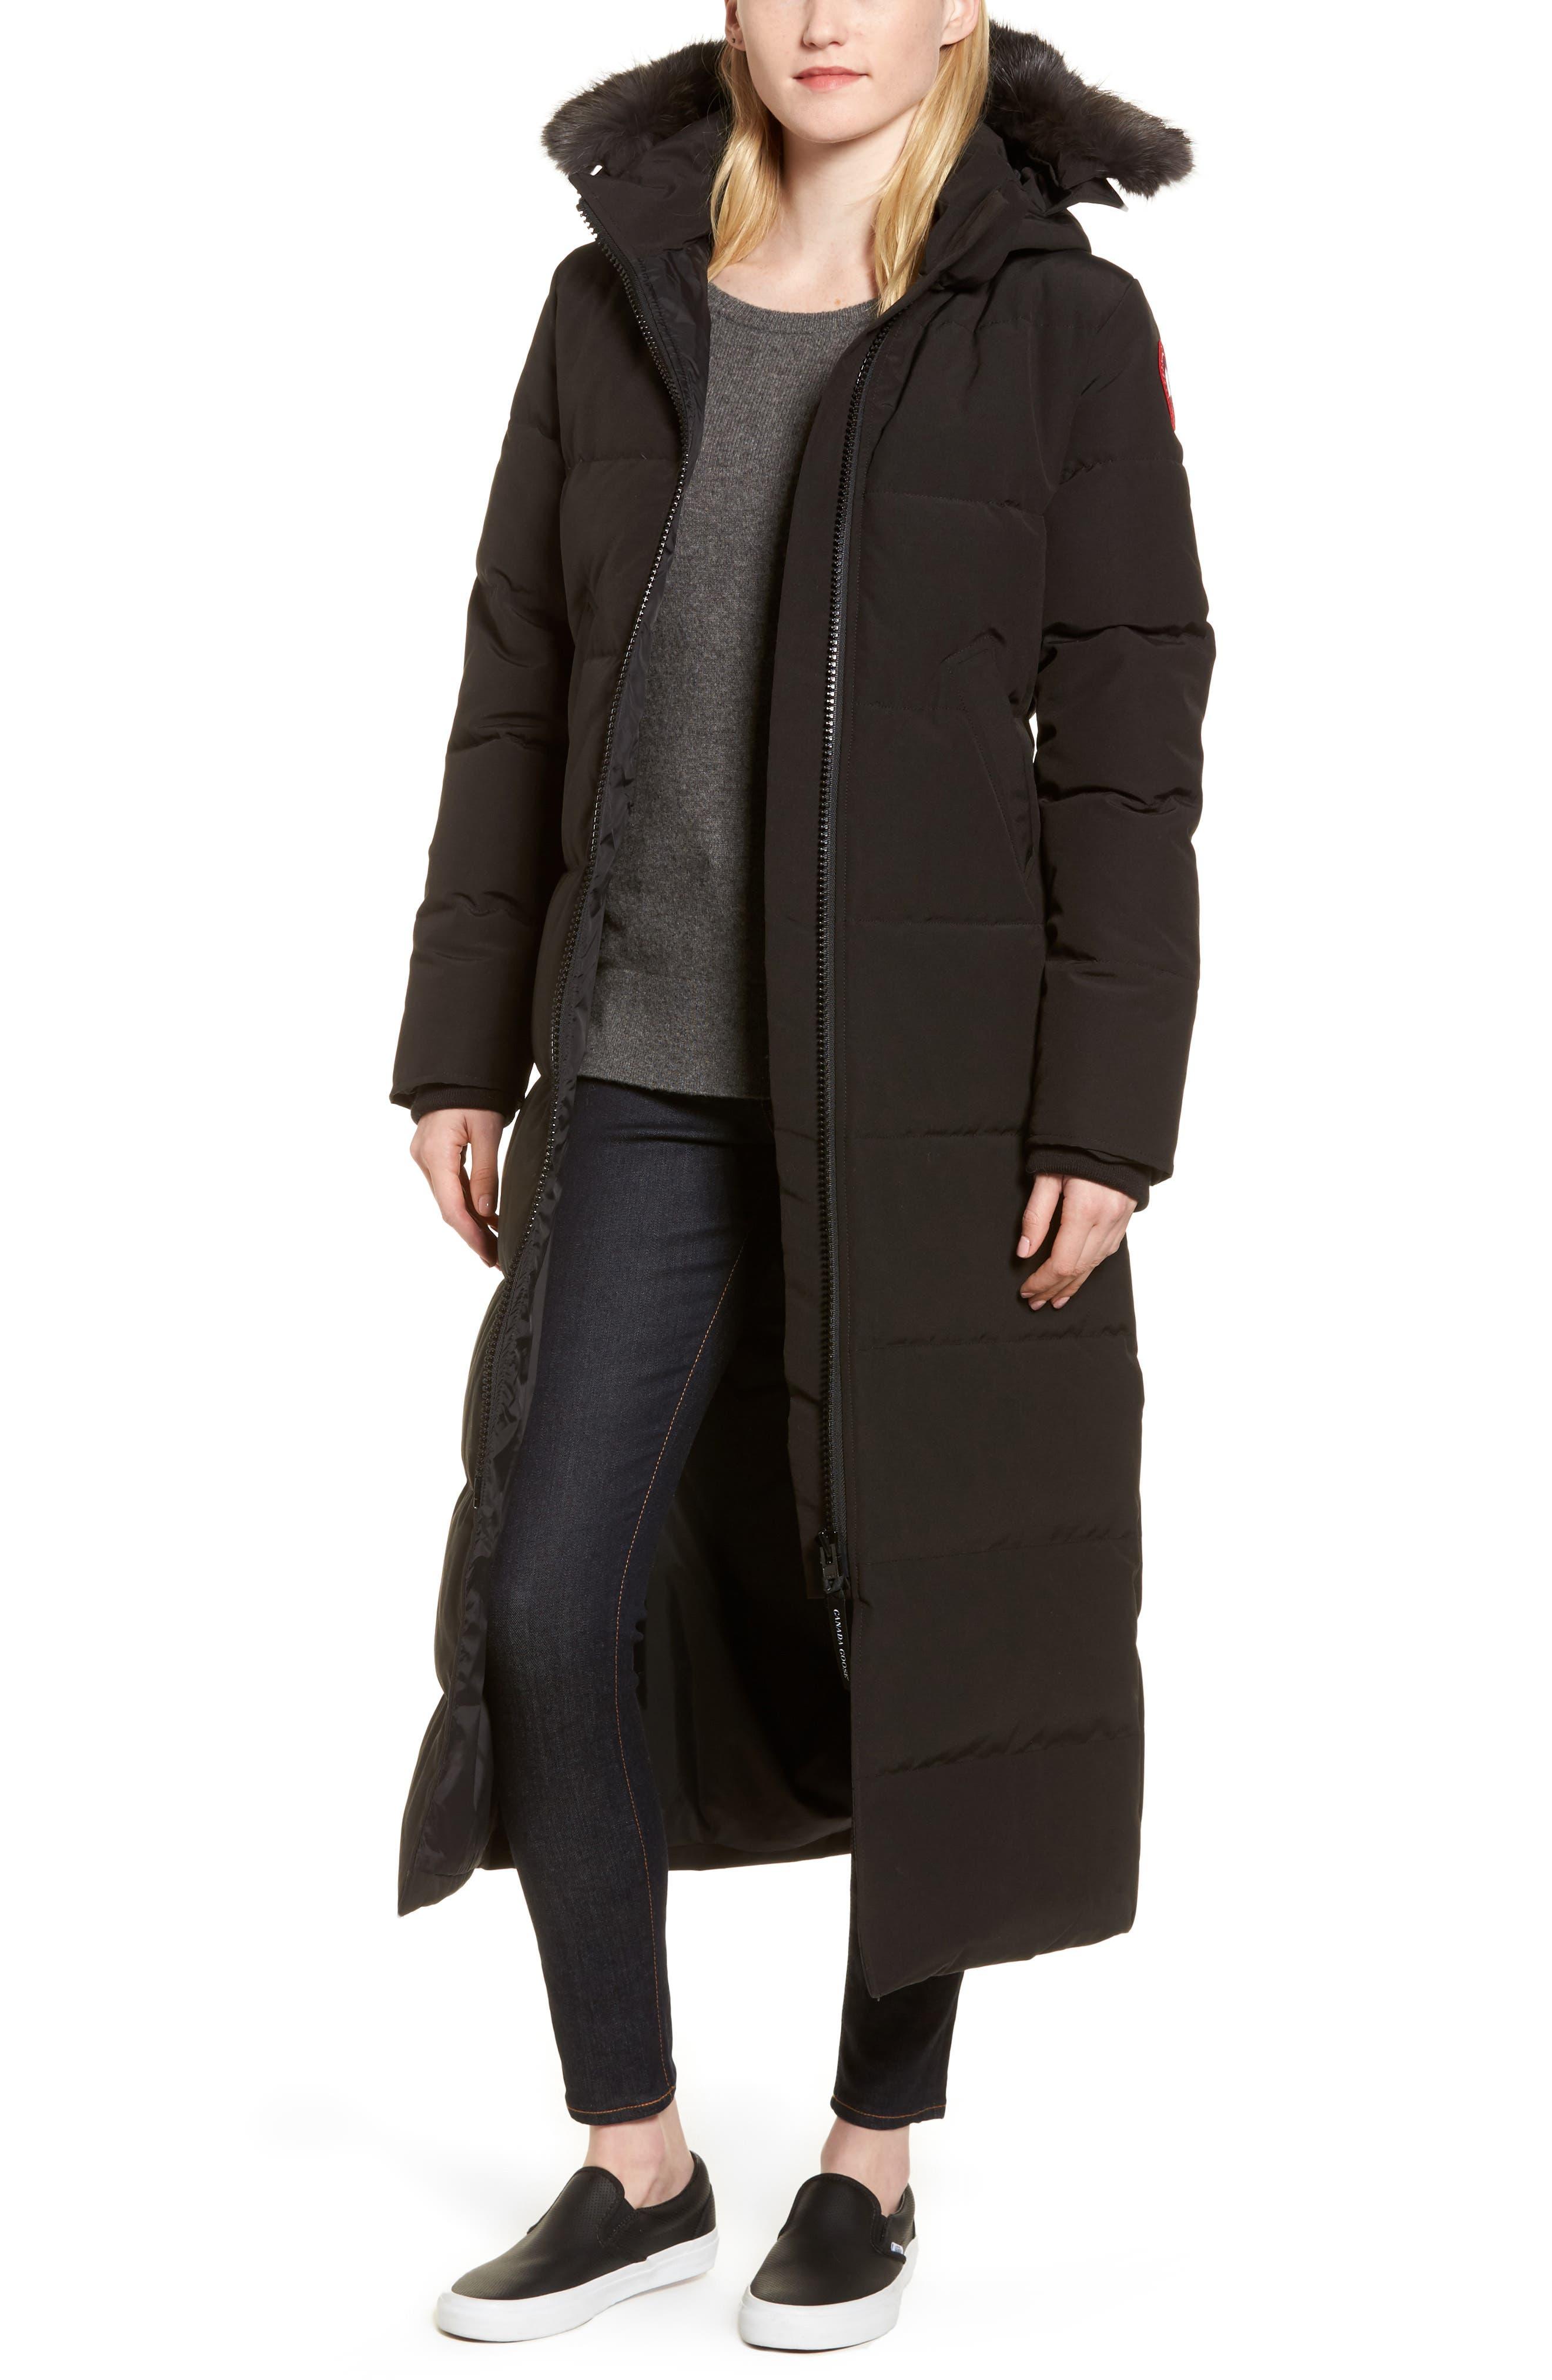 Canada Goose Mystique Regular Fit Down Parka With Genuine Coyote Fur Trim, (0) - Black